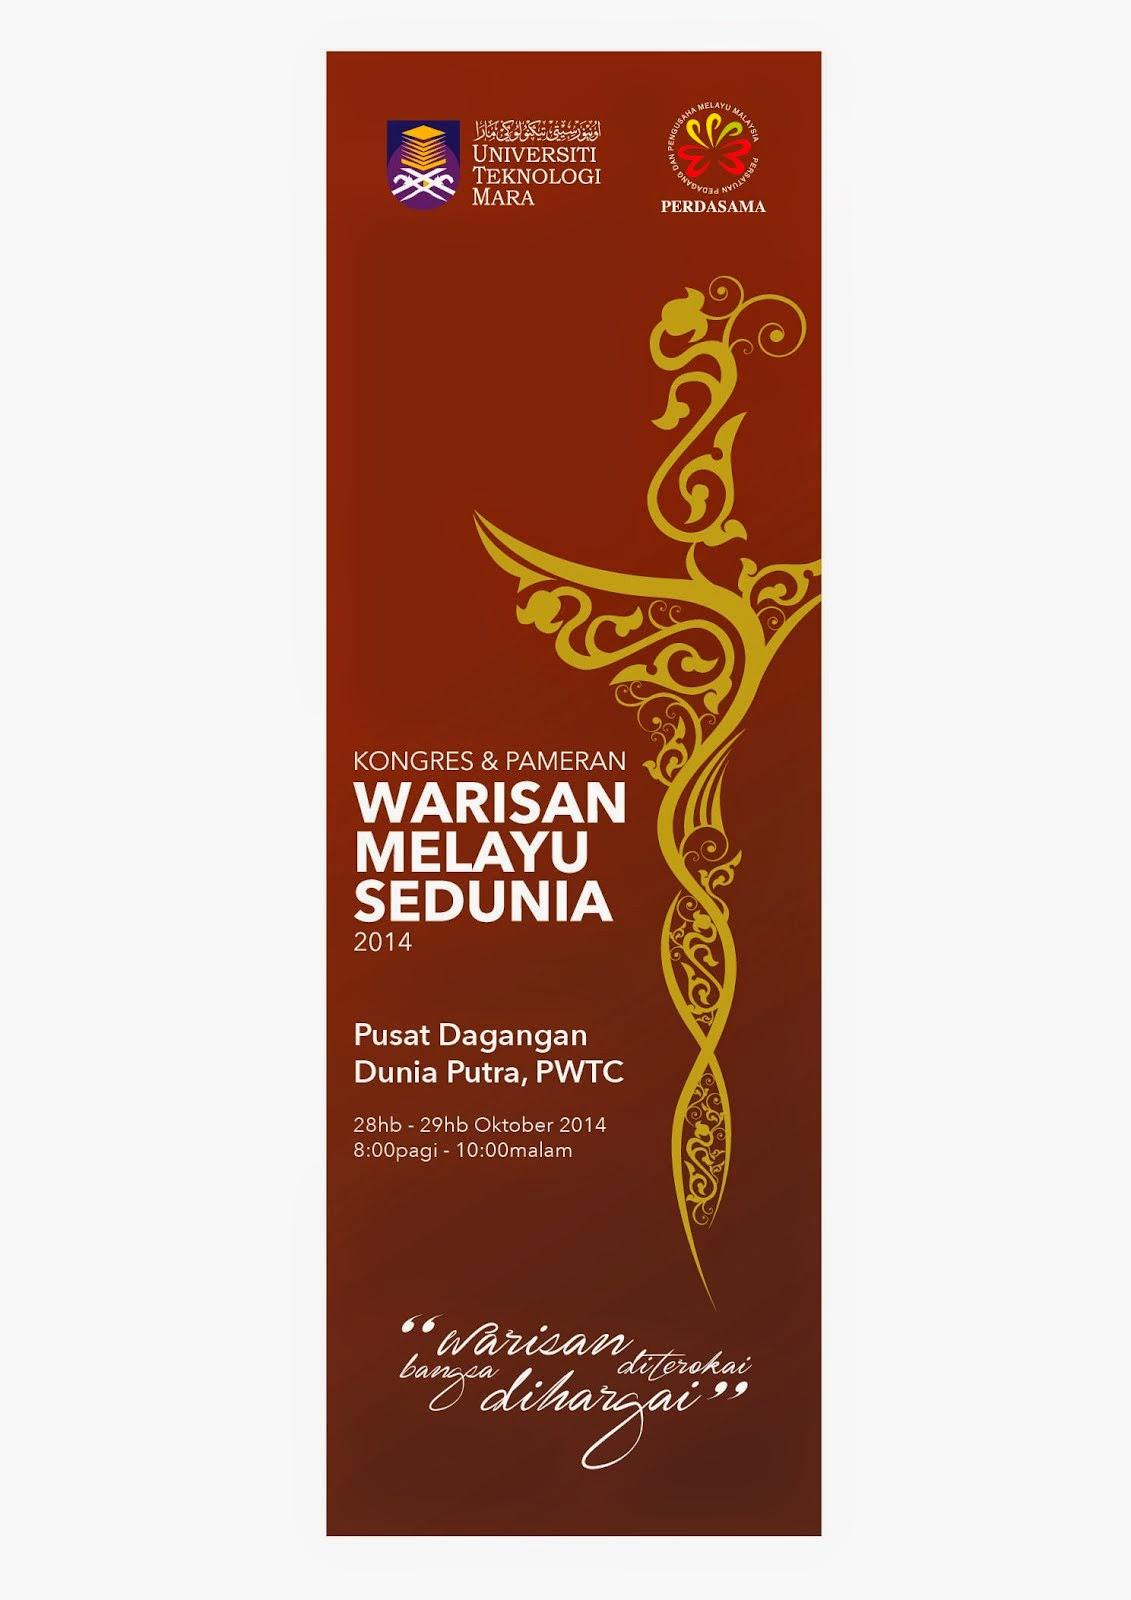 Warisan Melayu Sedunia